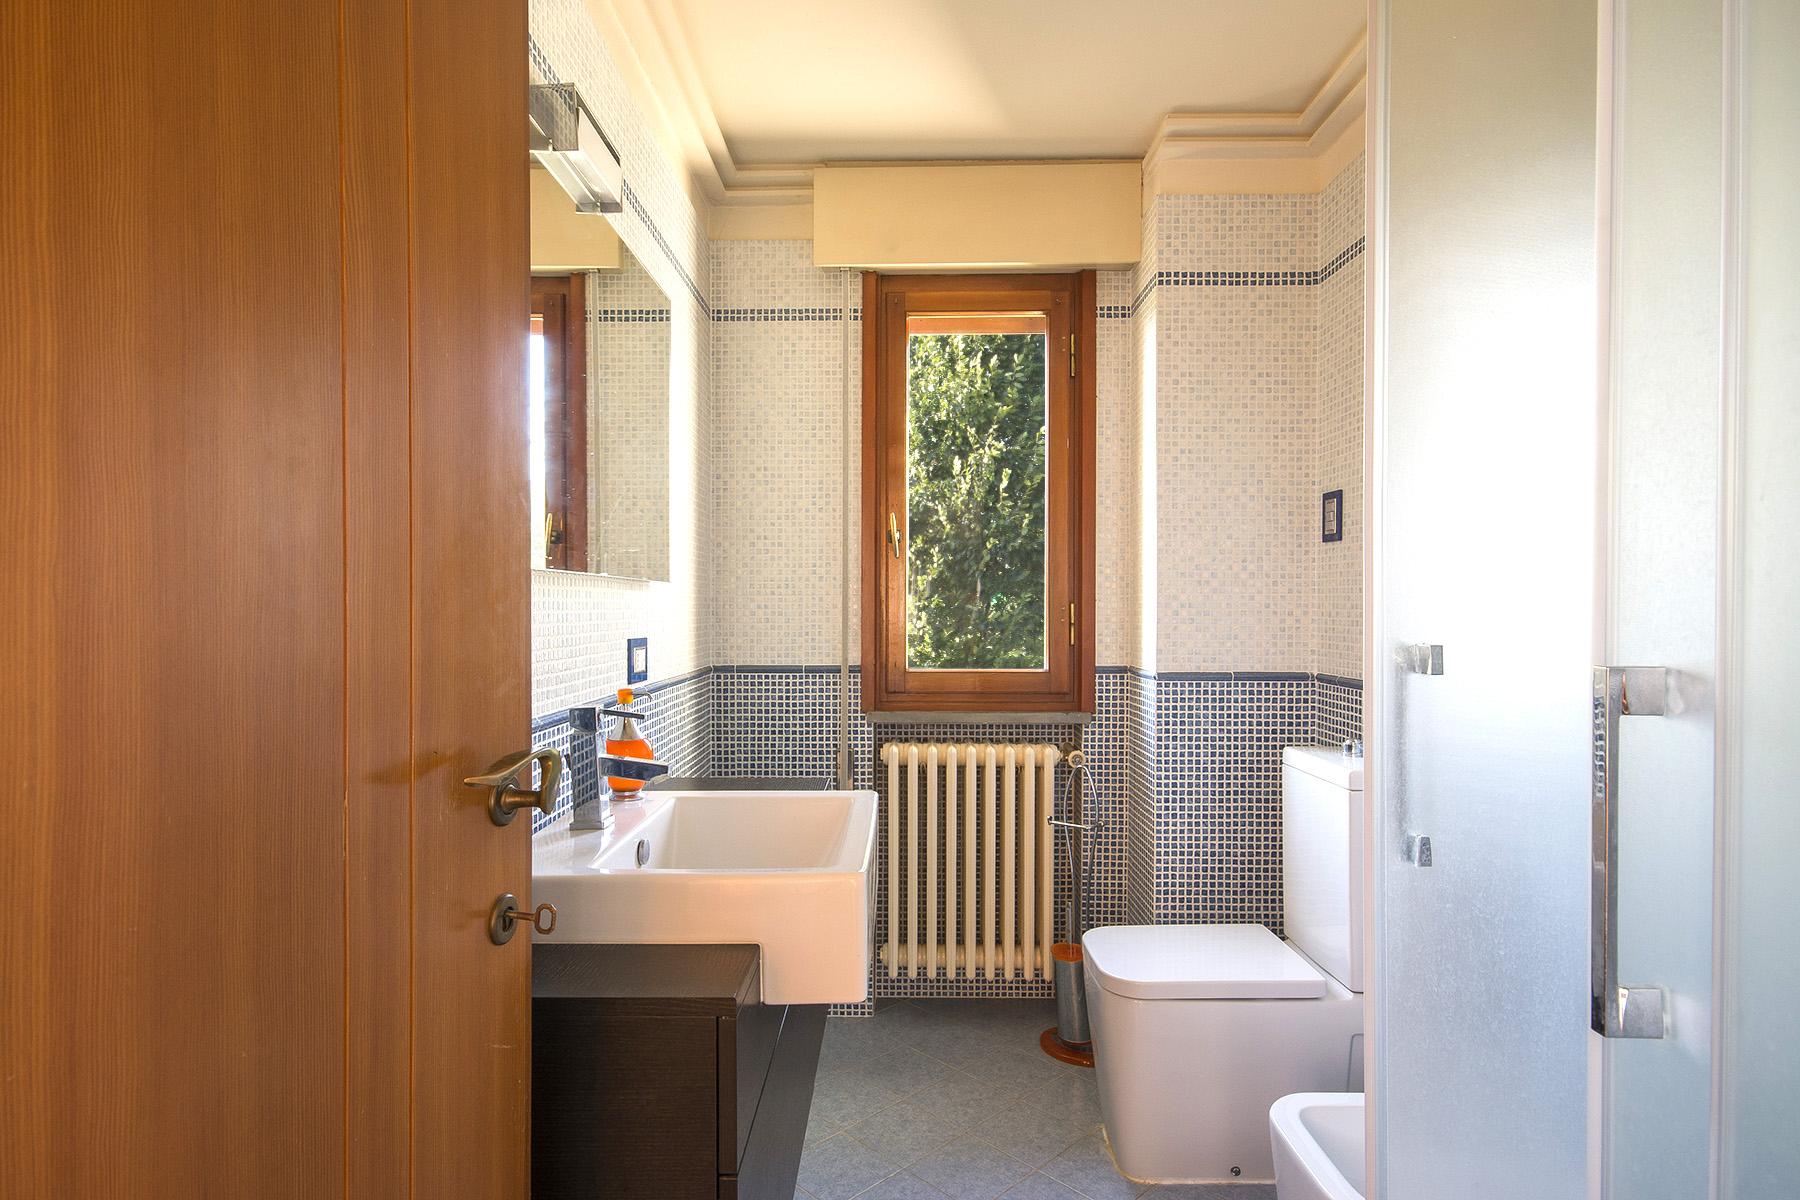 Villa in Vendita a Capannori: 5 locali, 500 mq - Foto 10